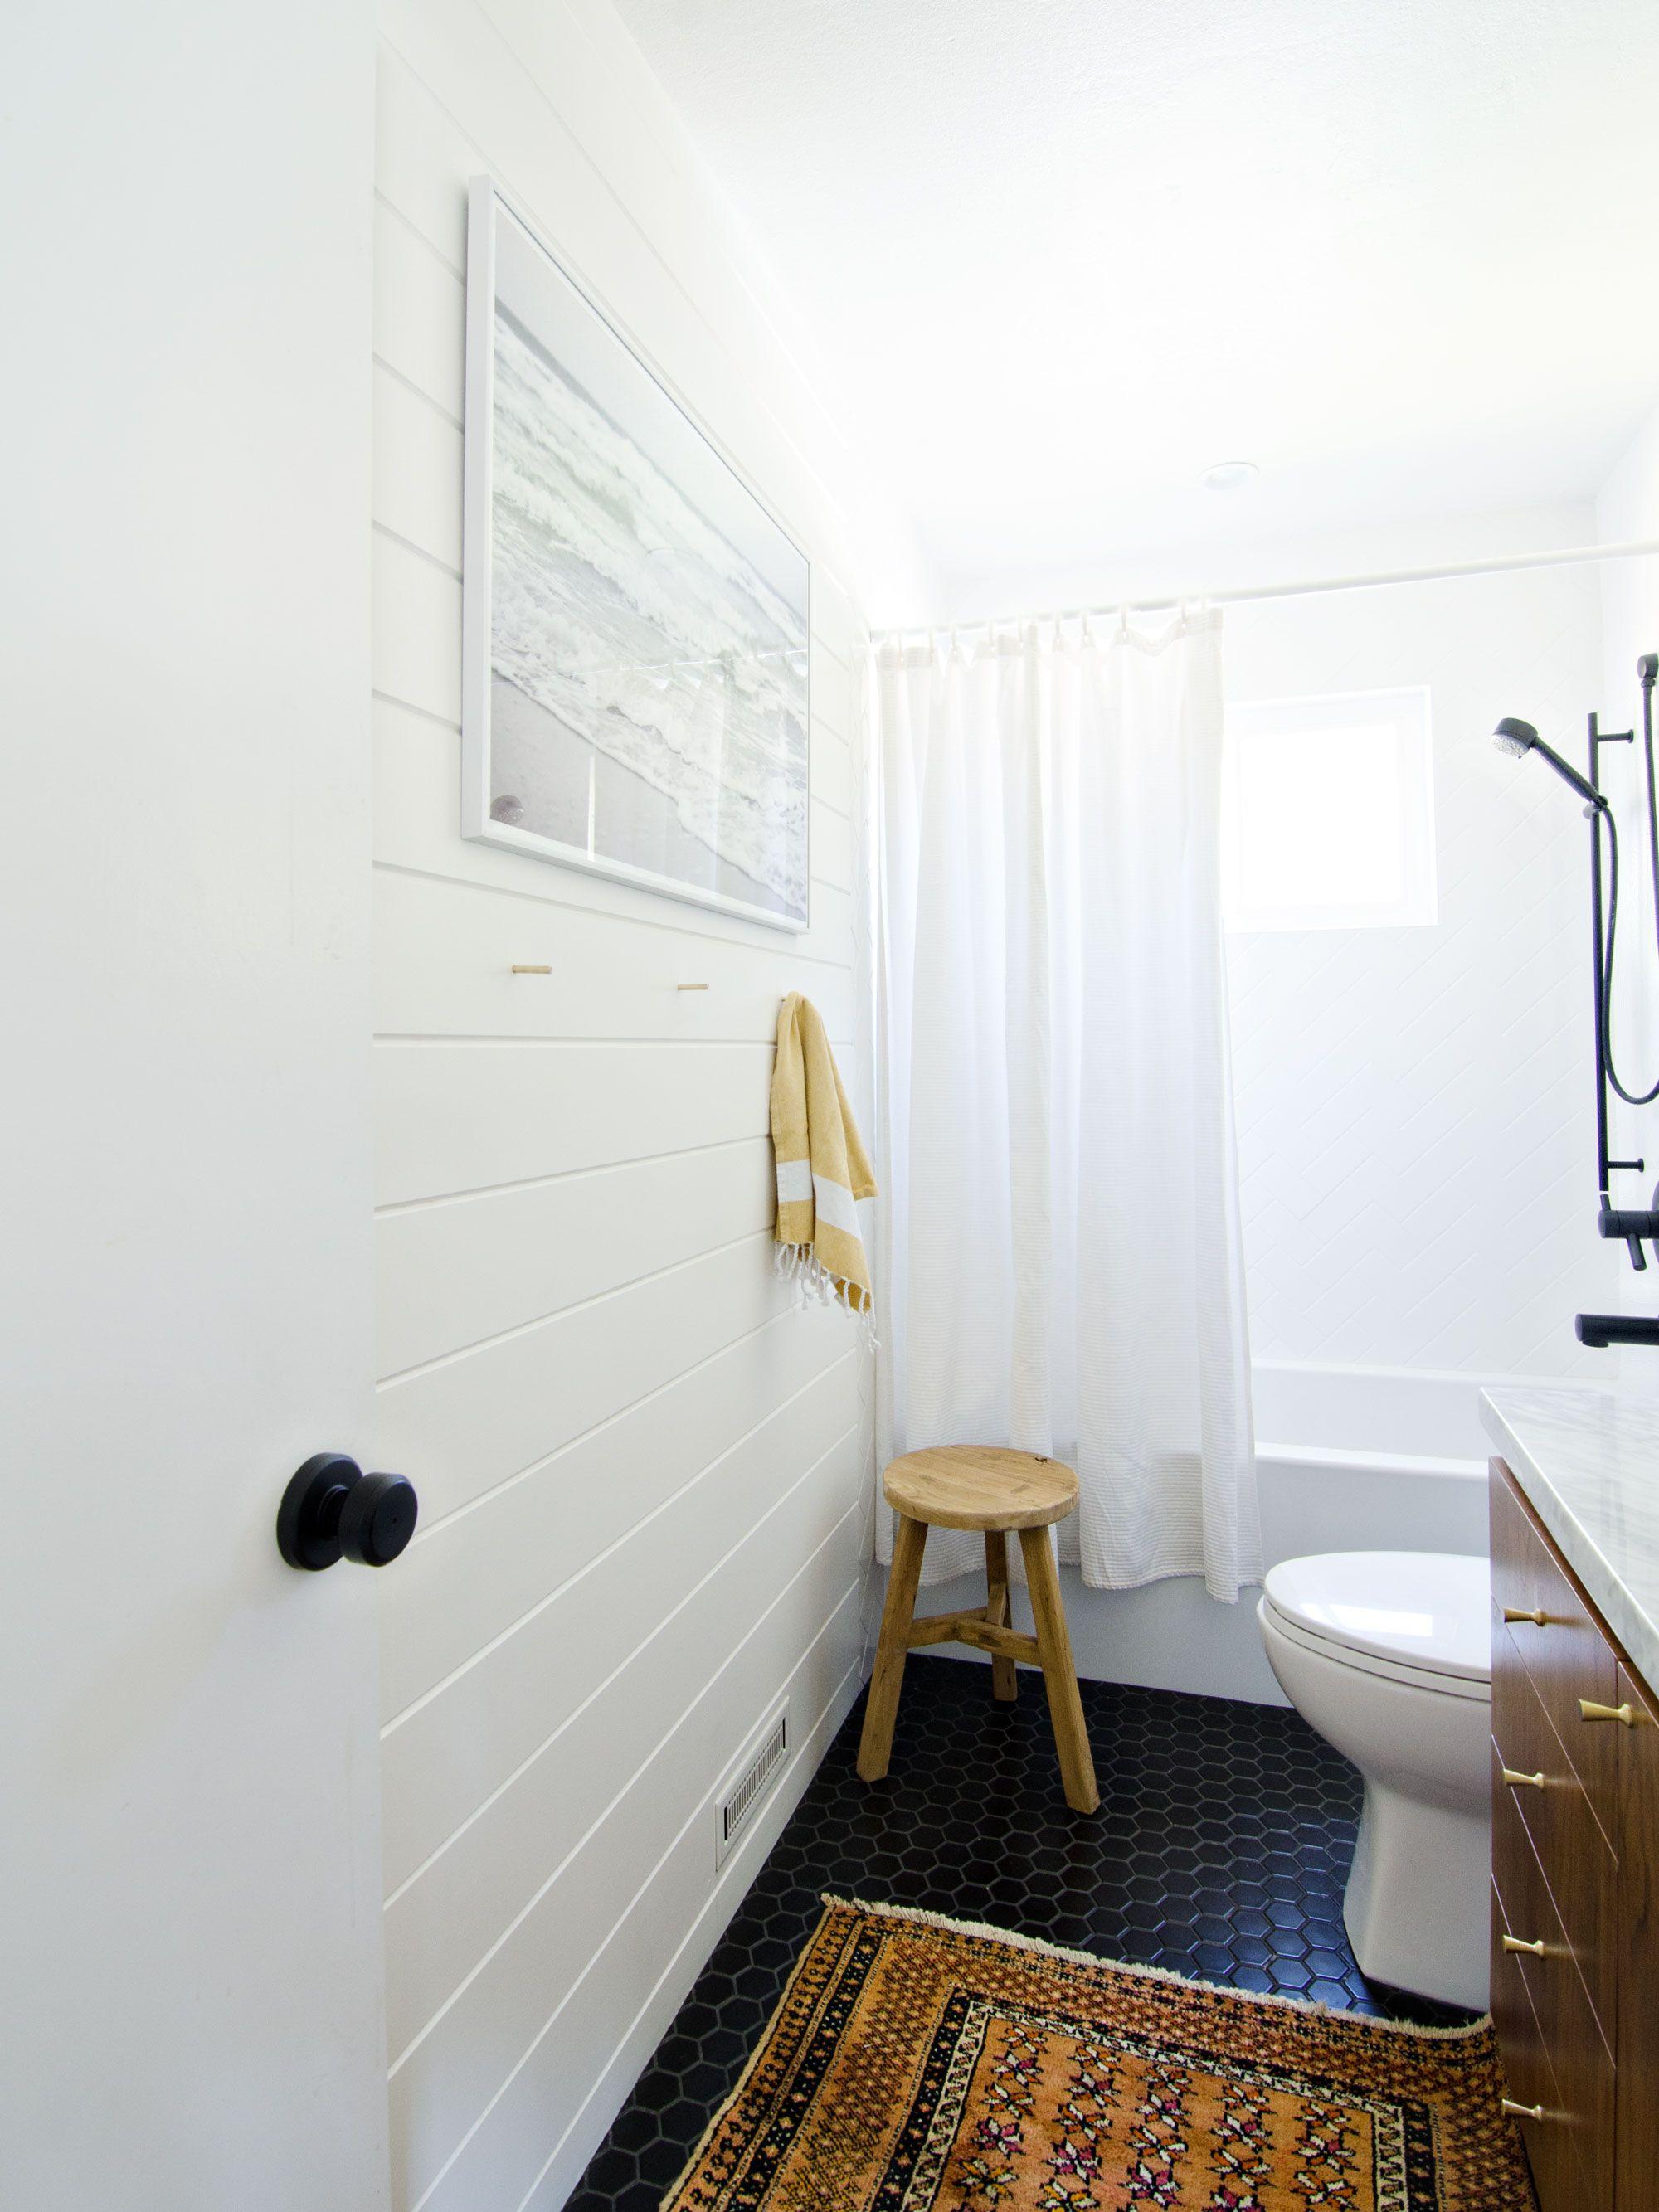 A Bathroom Has White Subway Tile And Dark Grout A Black And Walnut Vanity Has Black Drawer Pull Bathroom Light Fixtures Bathroom Black Fixtures Black Bathroom